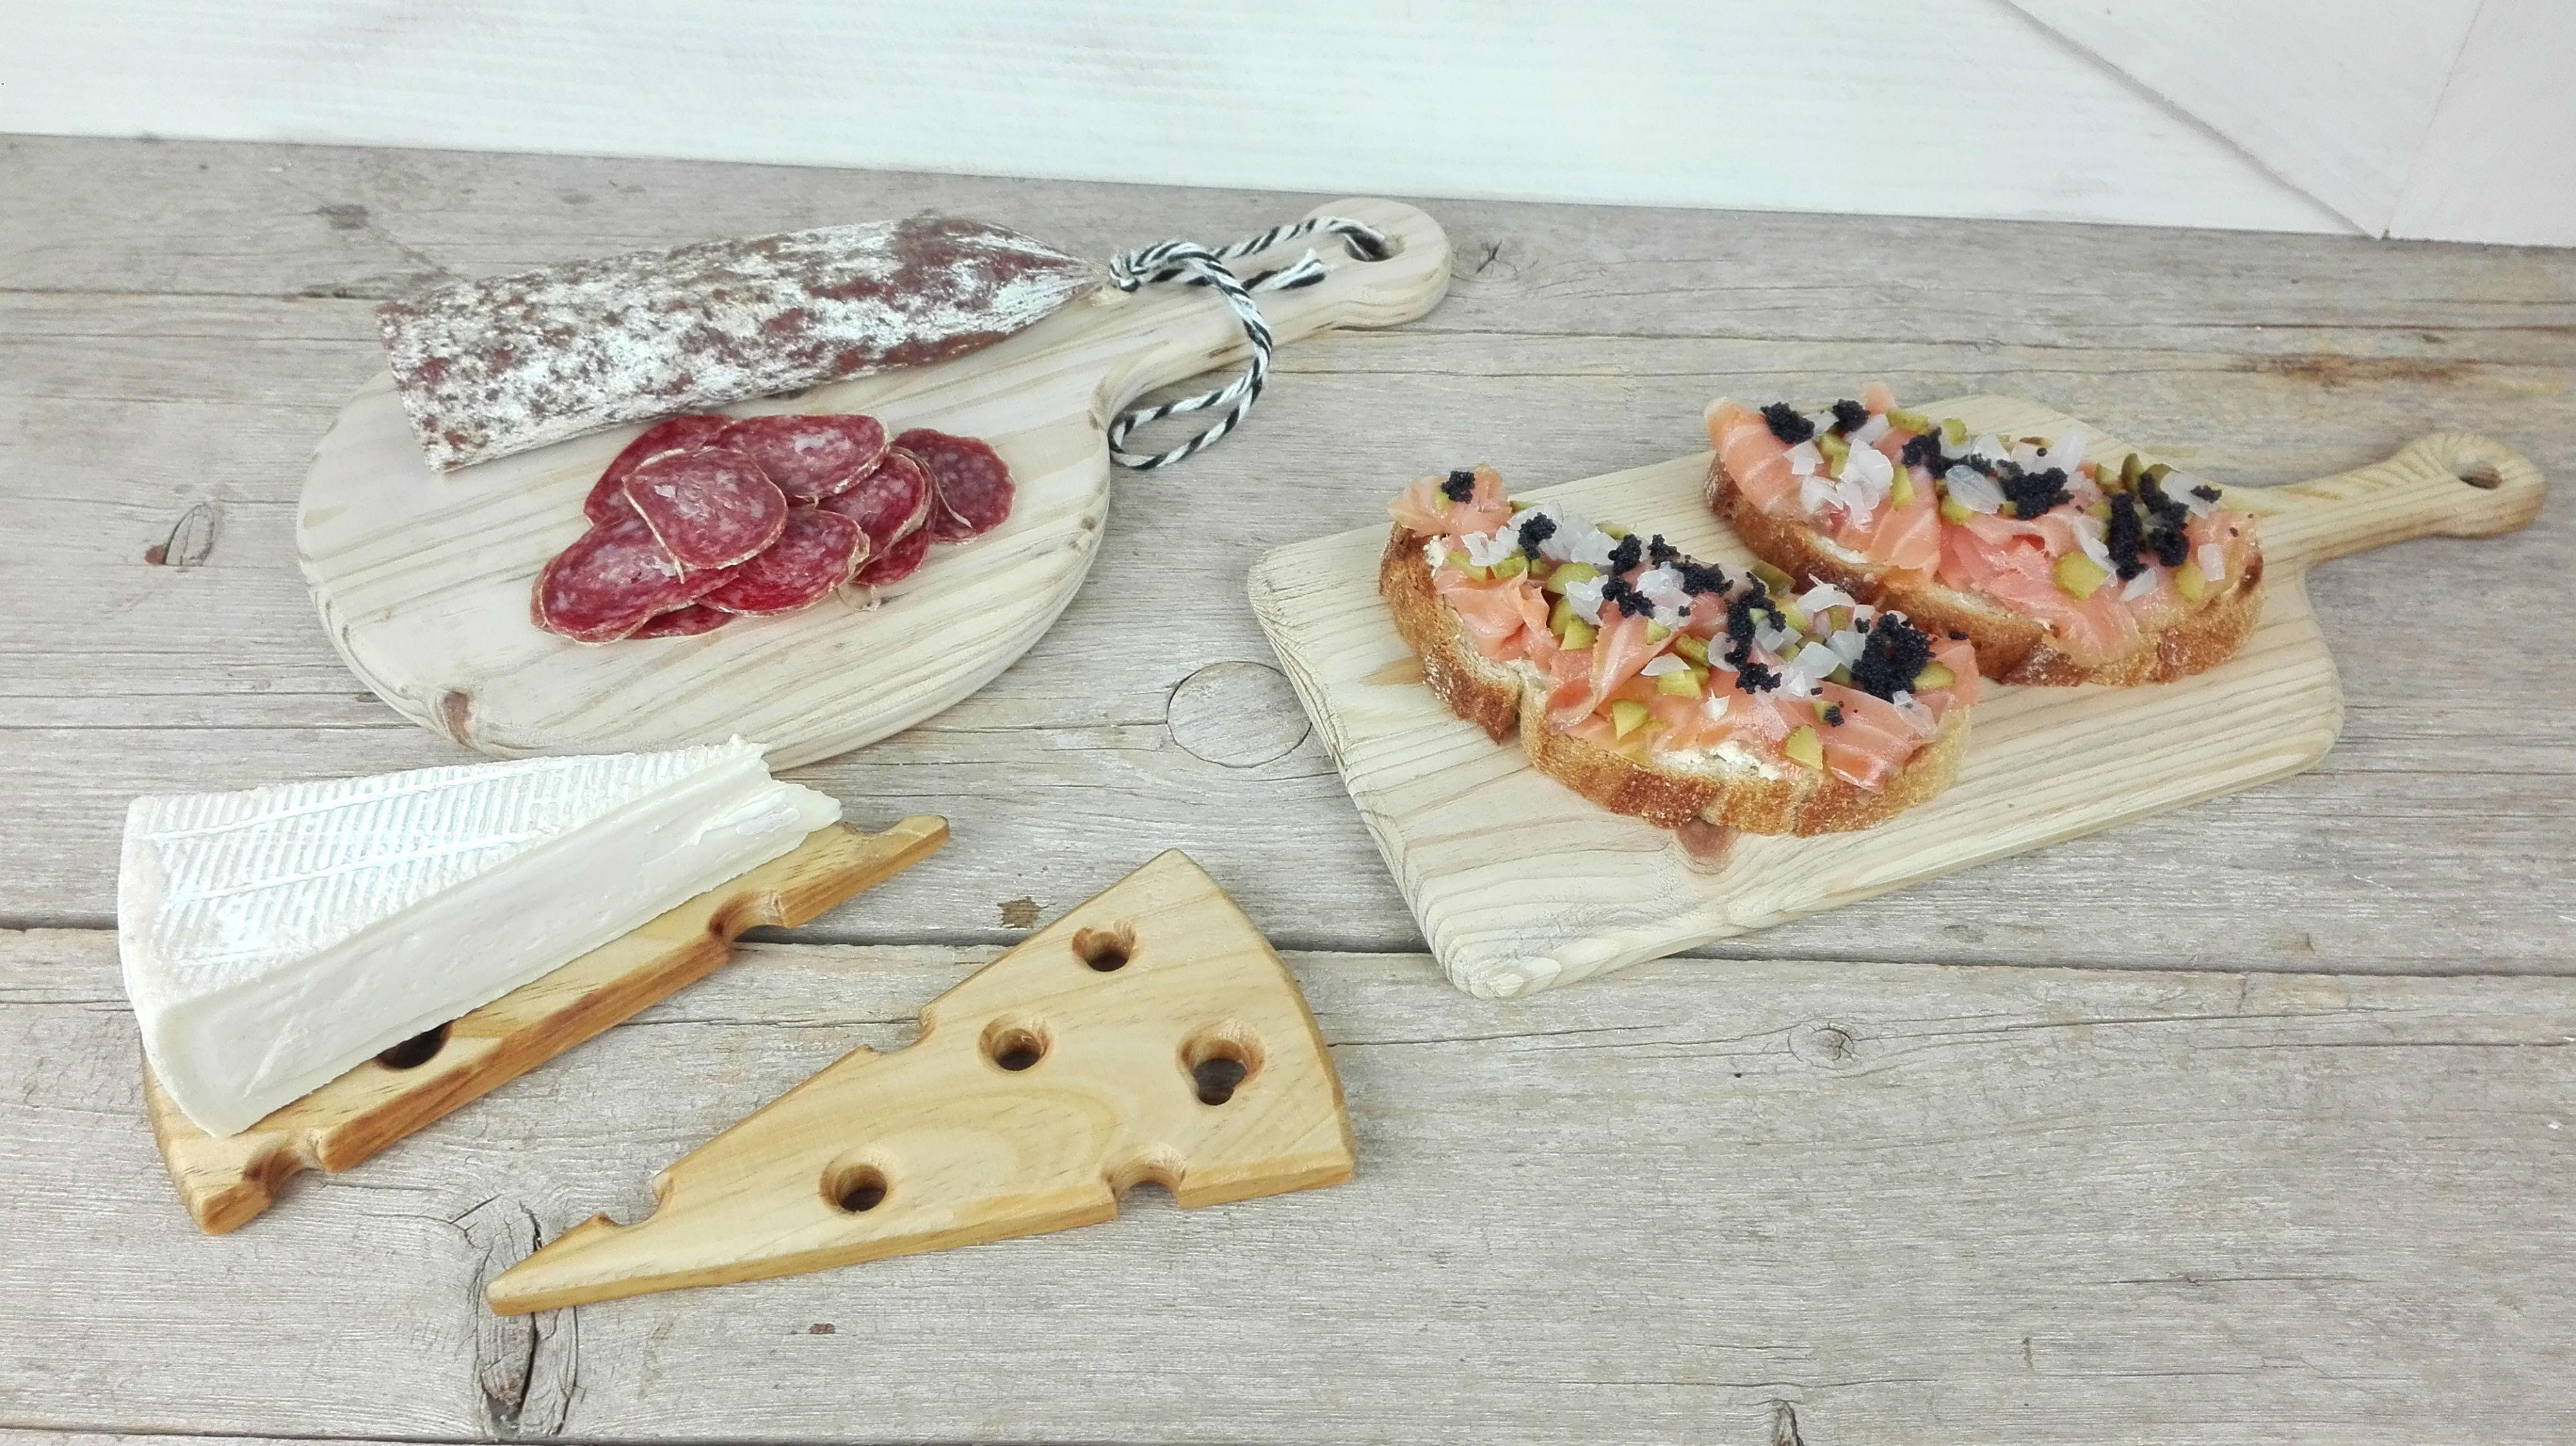 tablas madera servir comida